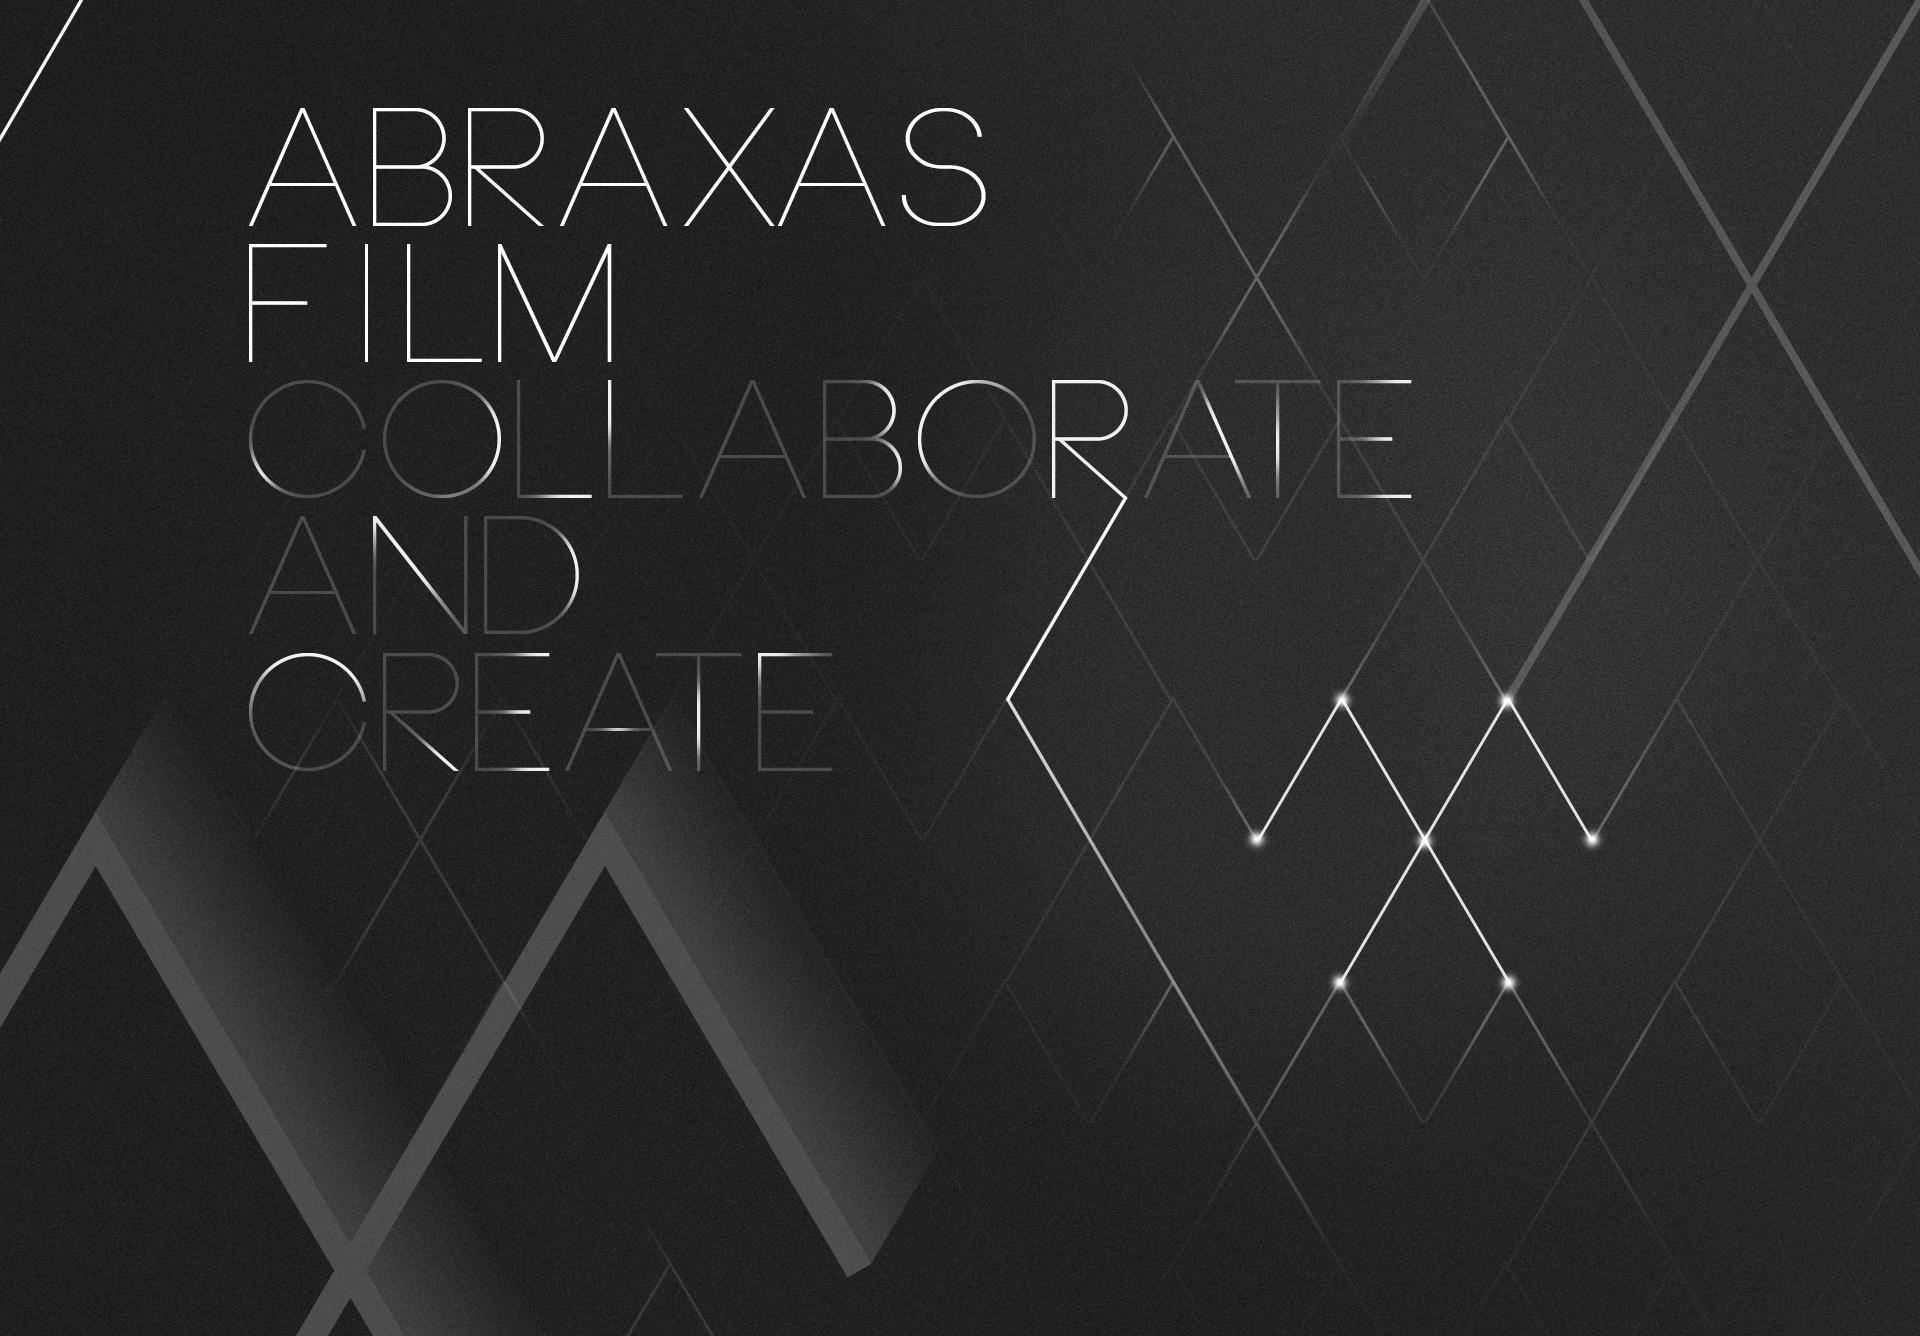 Abraxas slogan